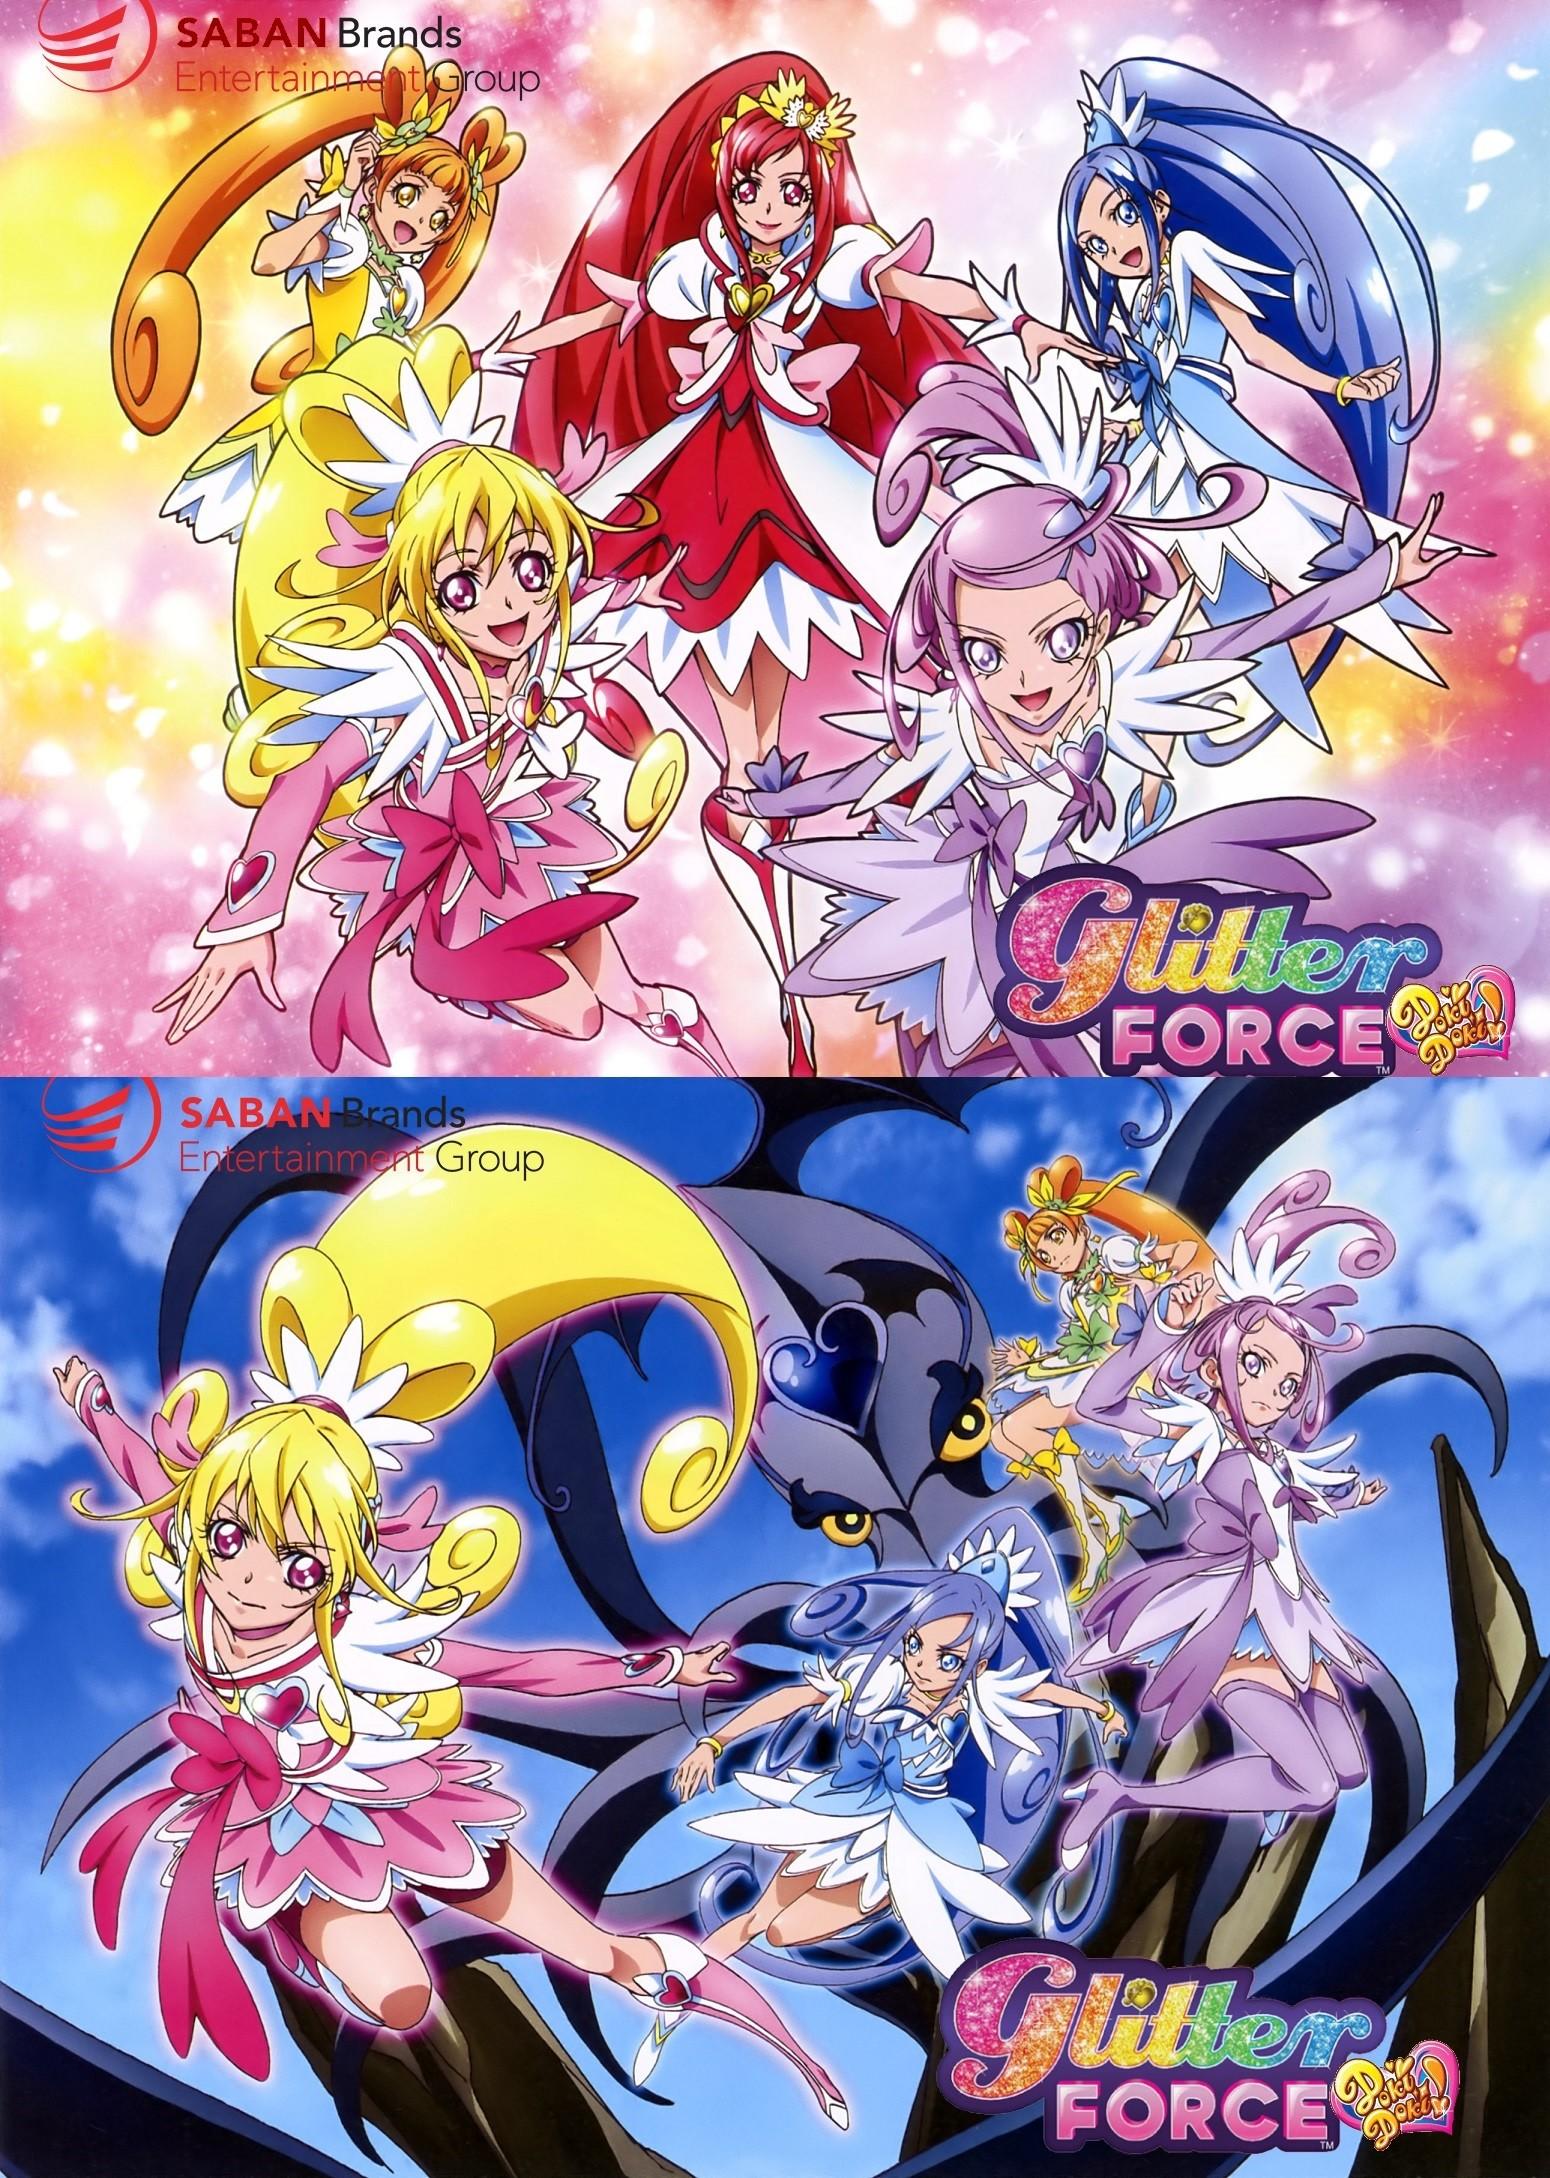 … StarWarriorDecade Glitter Force Doki Doki Custom Wallpapers by  StarWarriorDecade